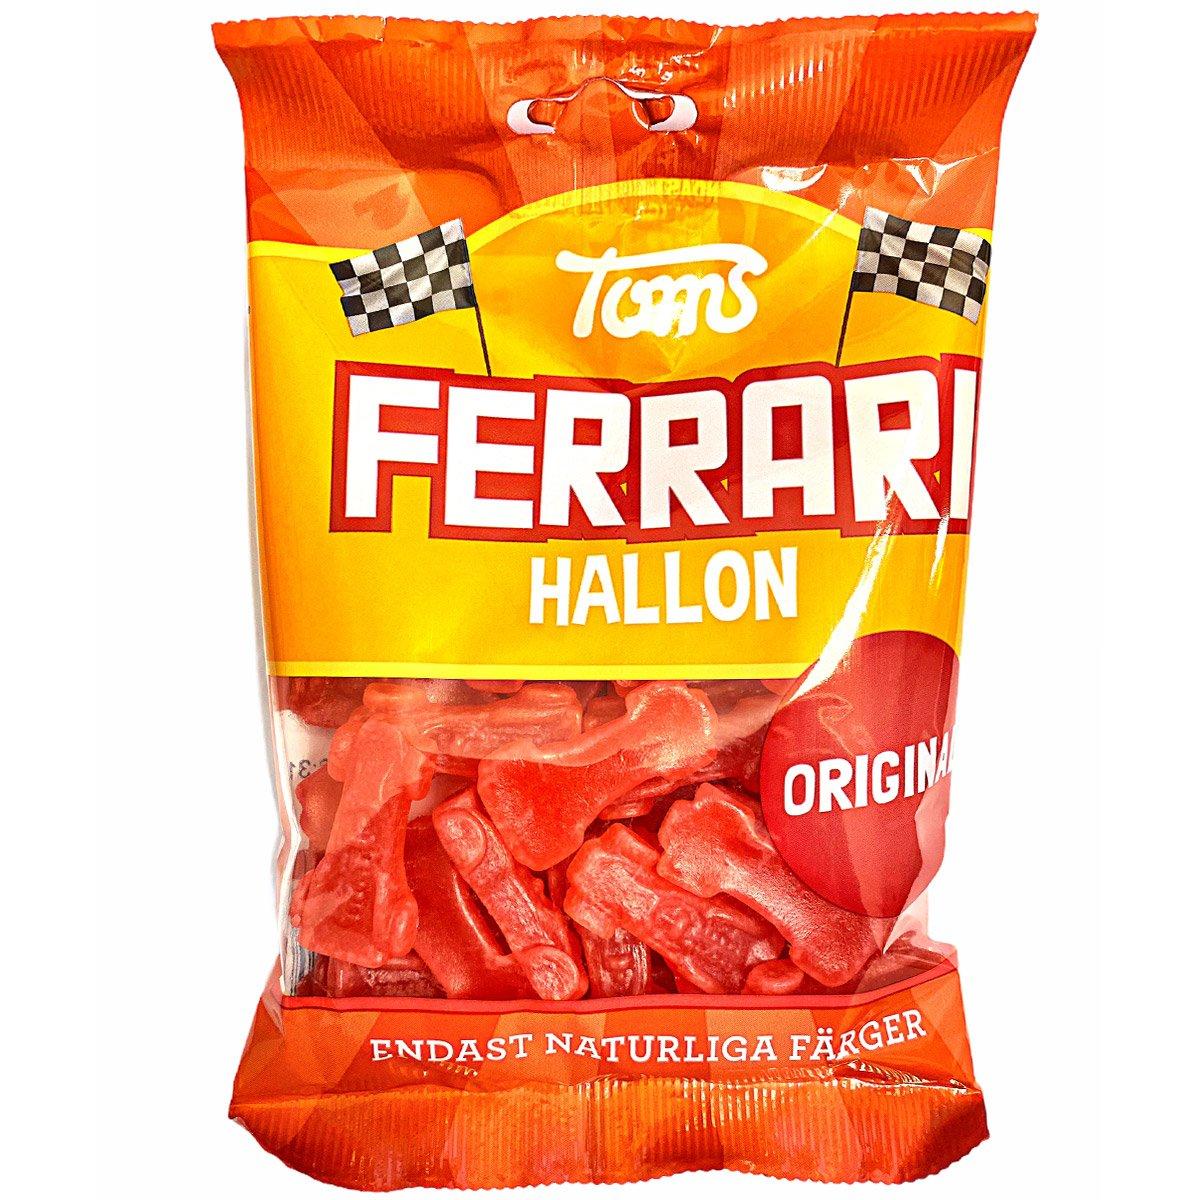 Toms Ferrari Hallon - Original (130g) 1